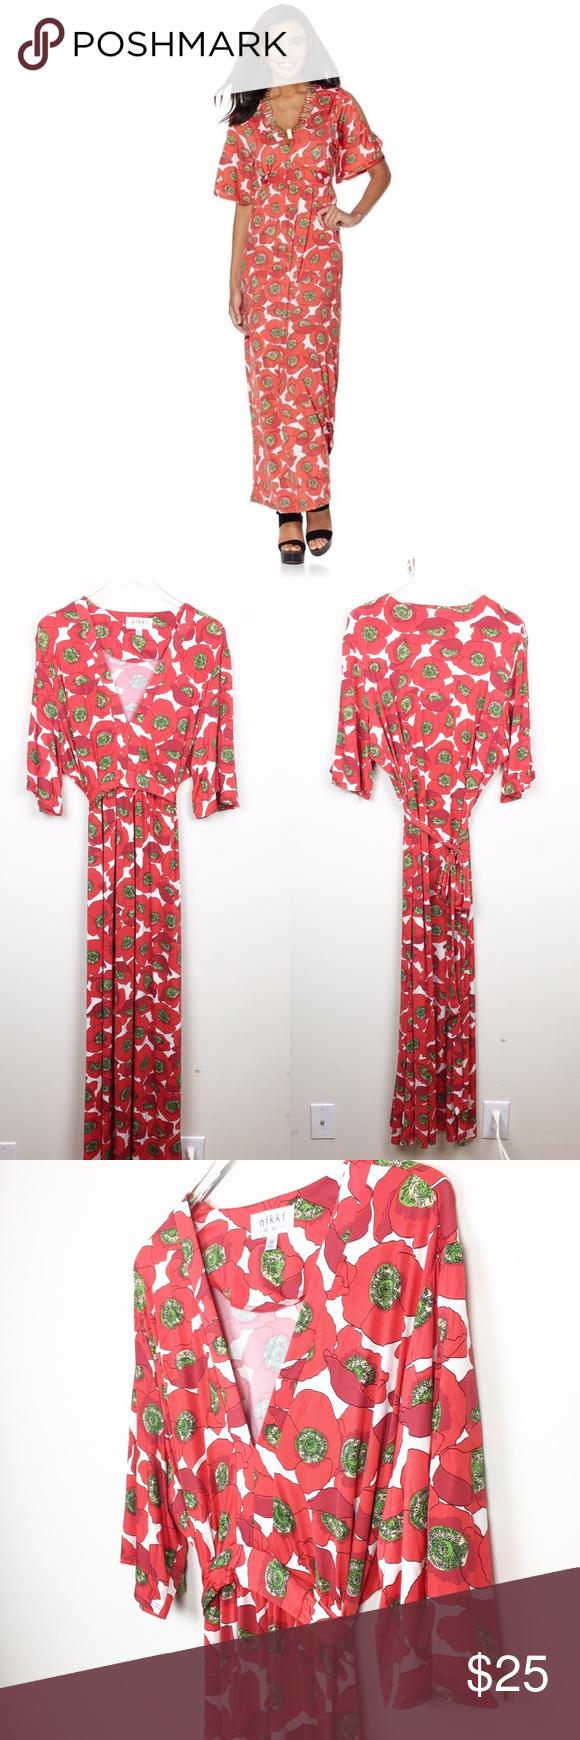 Nikki Poulos Plus Size Poppy Maxi Dress Qvc Floral Print Maxi Dress Dresses Maxi Dress [ 1740 x 580 Pixel ]